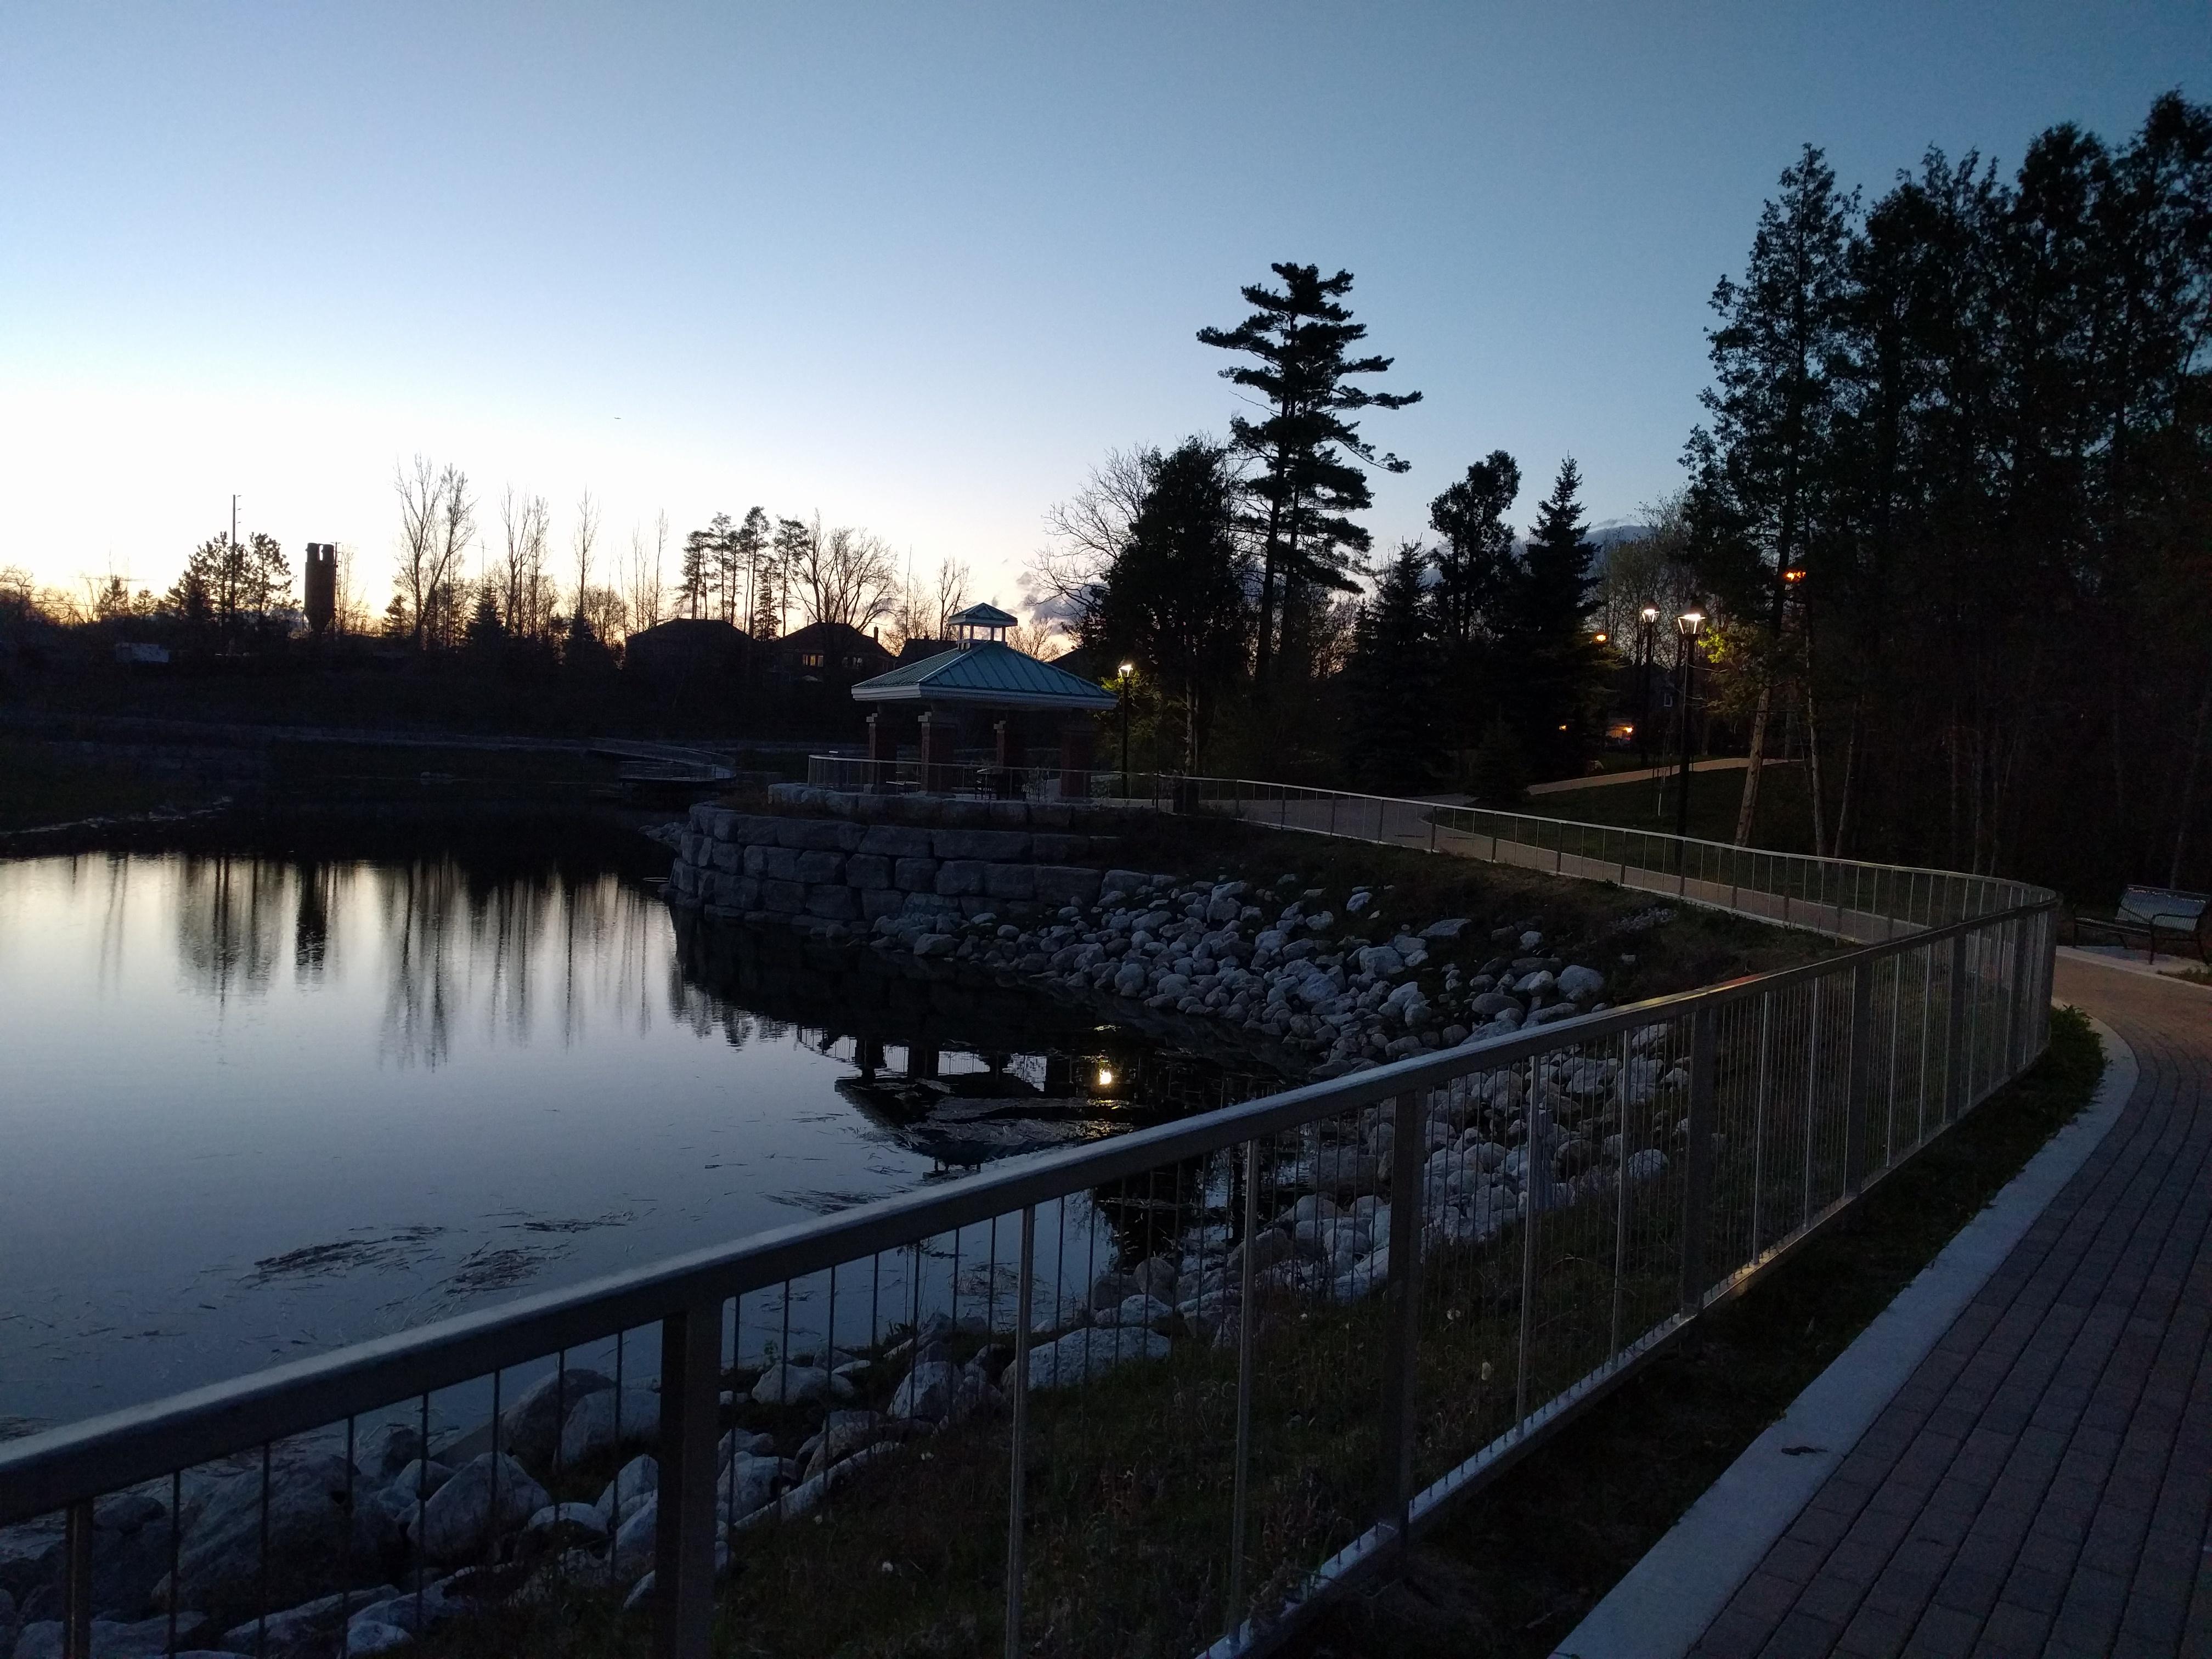 Jordan Lampert's other pond